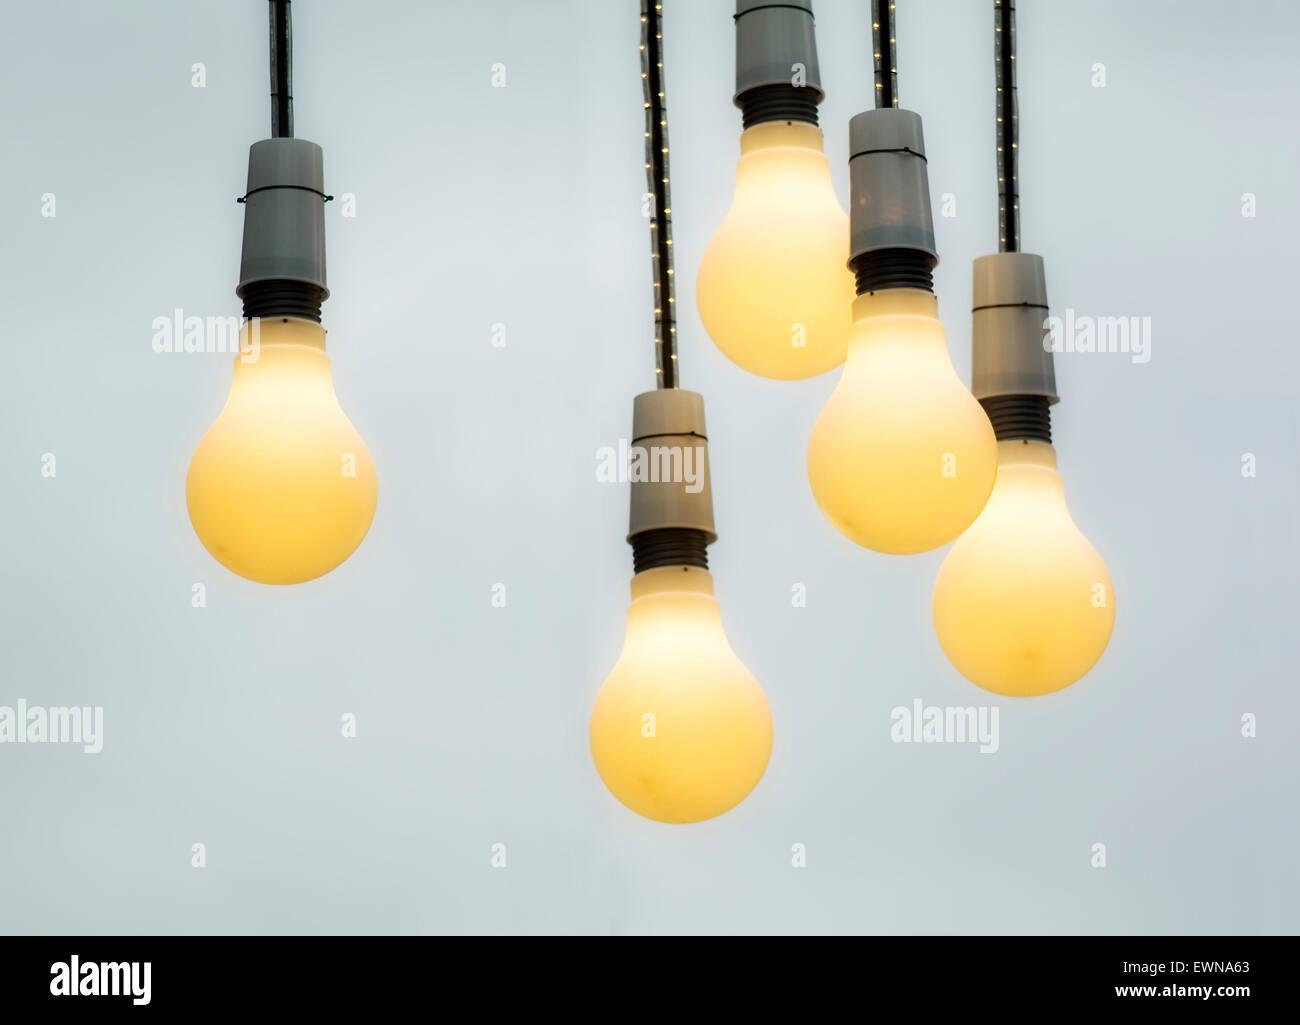 Oversized lamps hanging in a street as christmas illumination london england UK europe - Stock Image